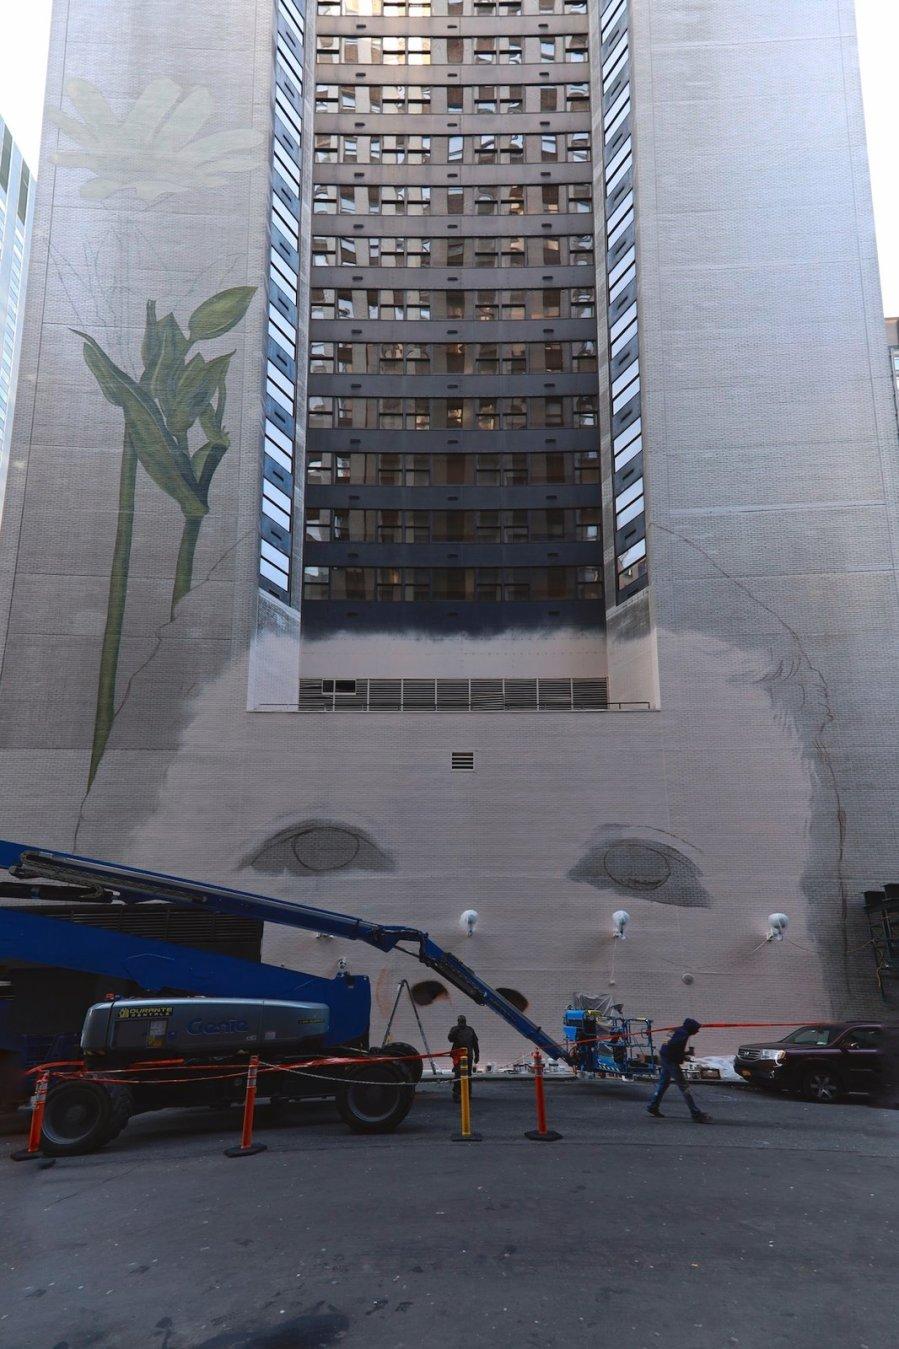 ILO-art-walk-100-street-art-manhattan-pc-just-a-spectator-6